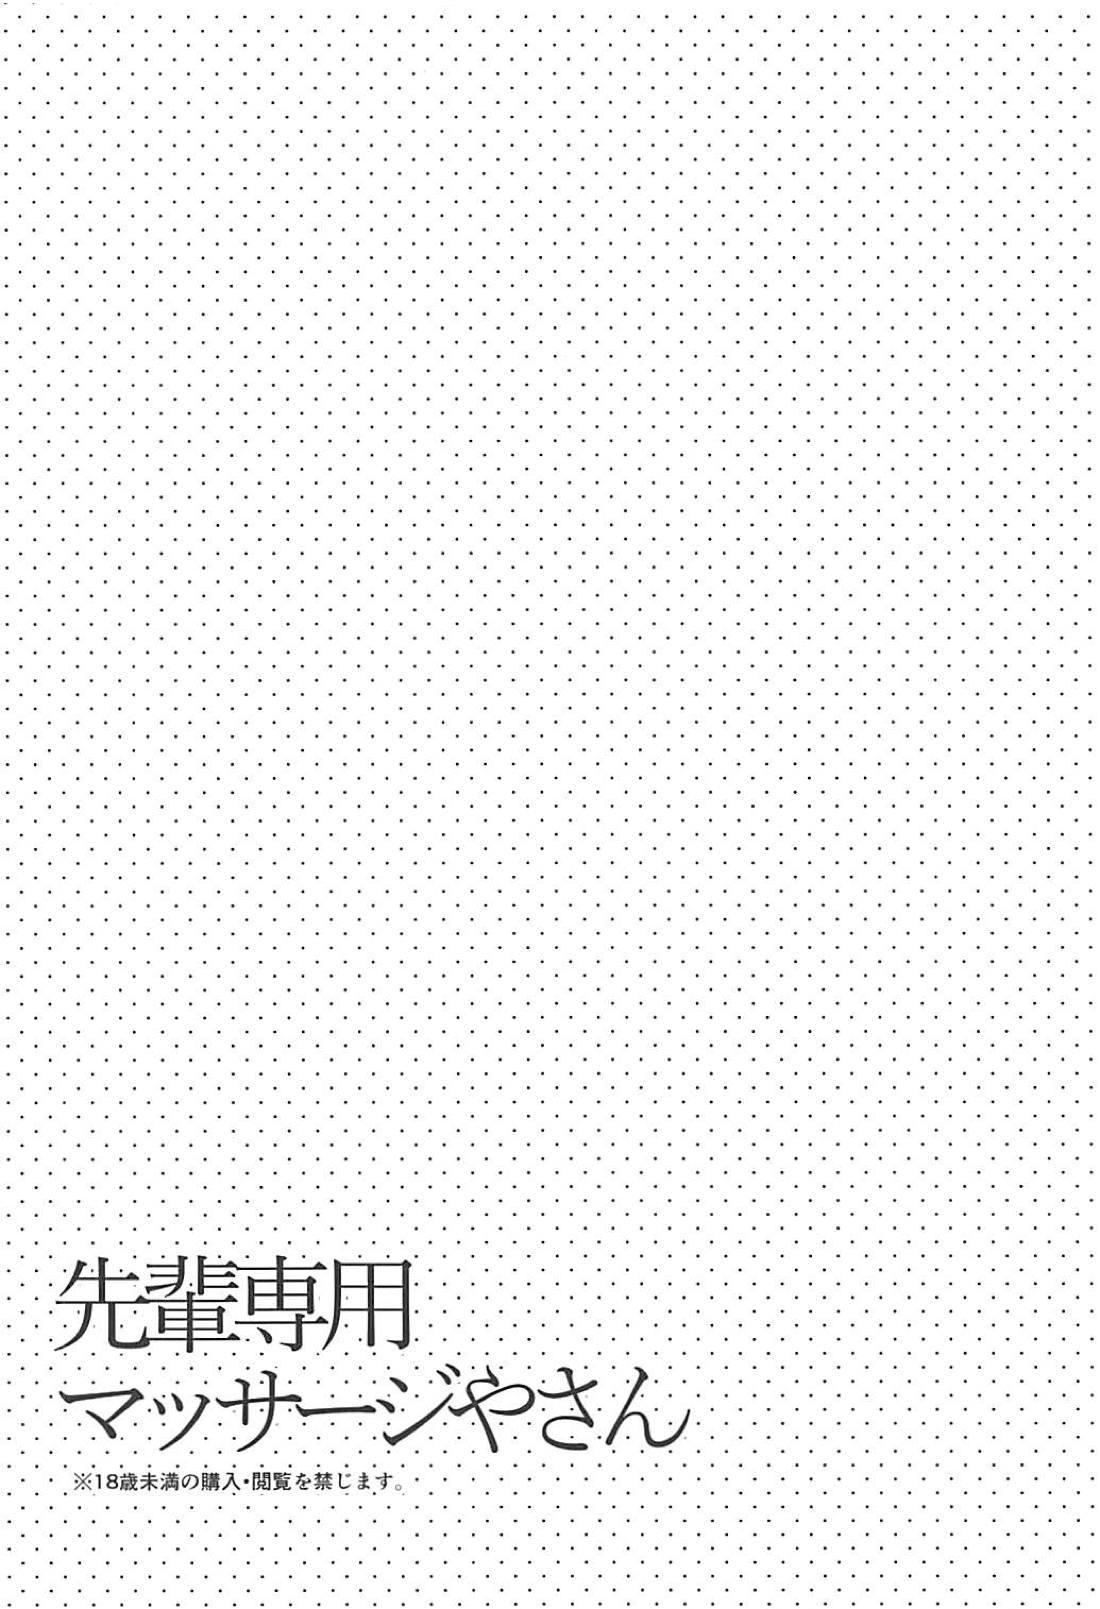 (C94) [Yuzuya (Yuzuha)] Senpai Senyou Massage-ya-san (Fate/Grand Order) 2